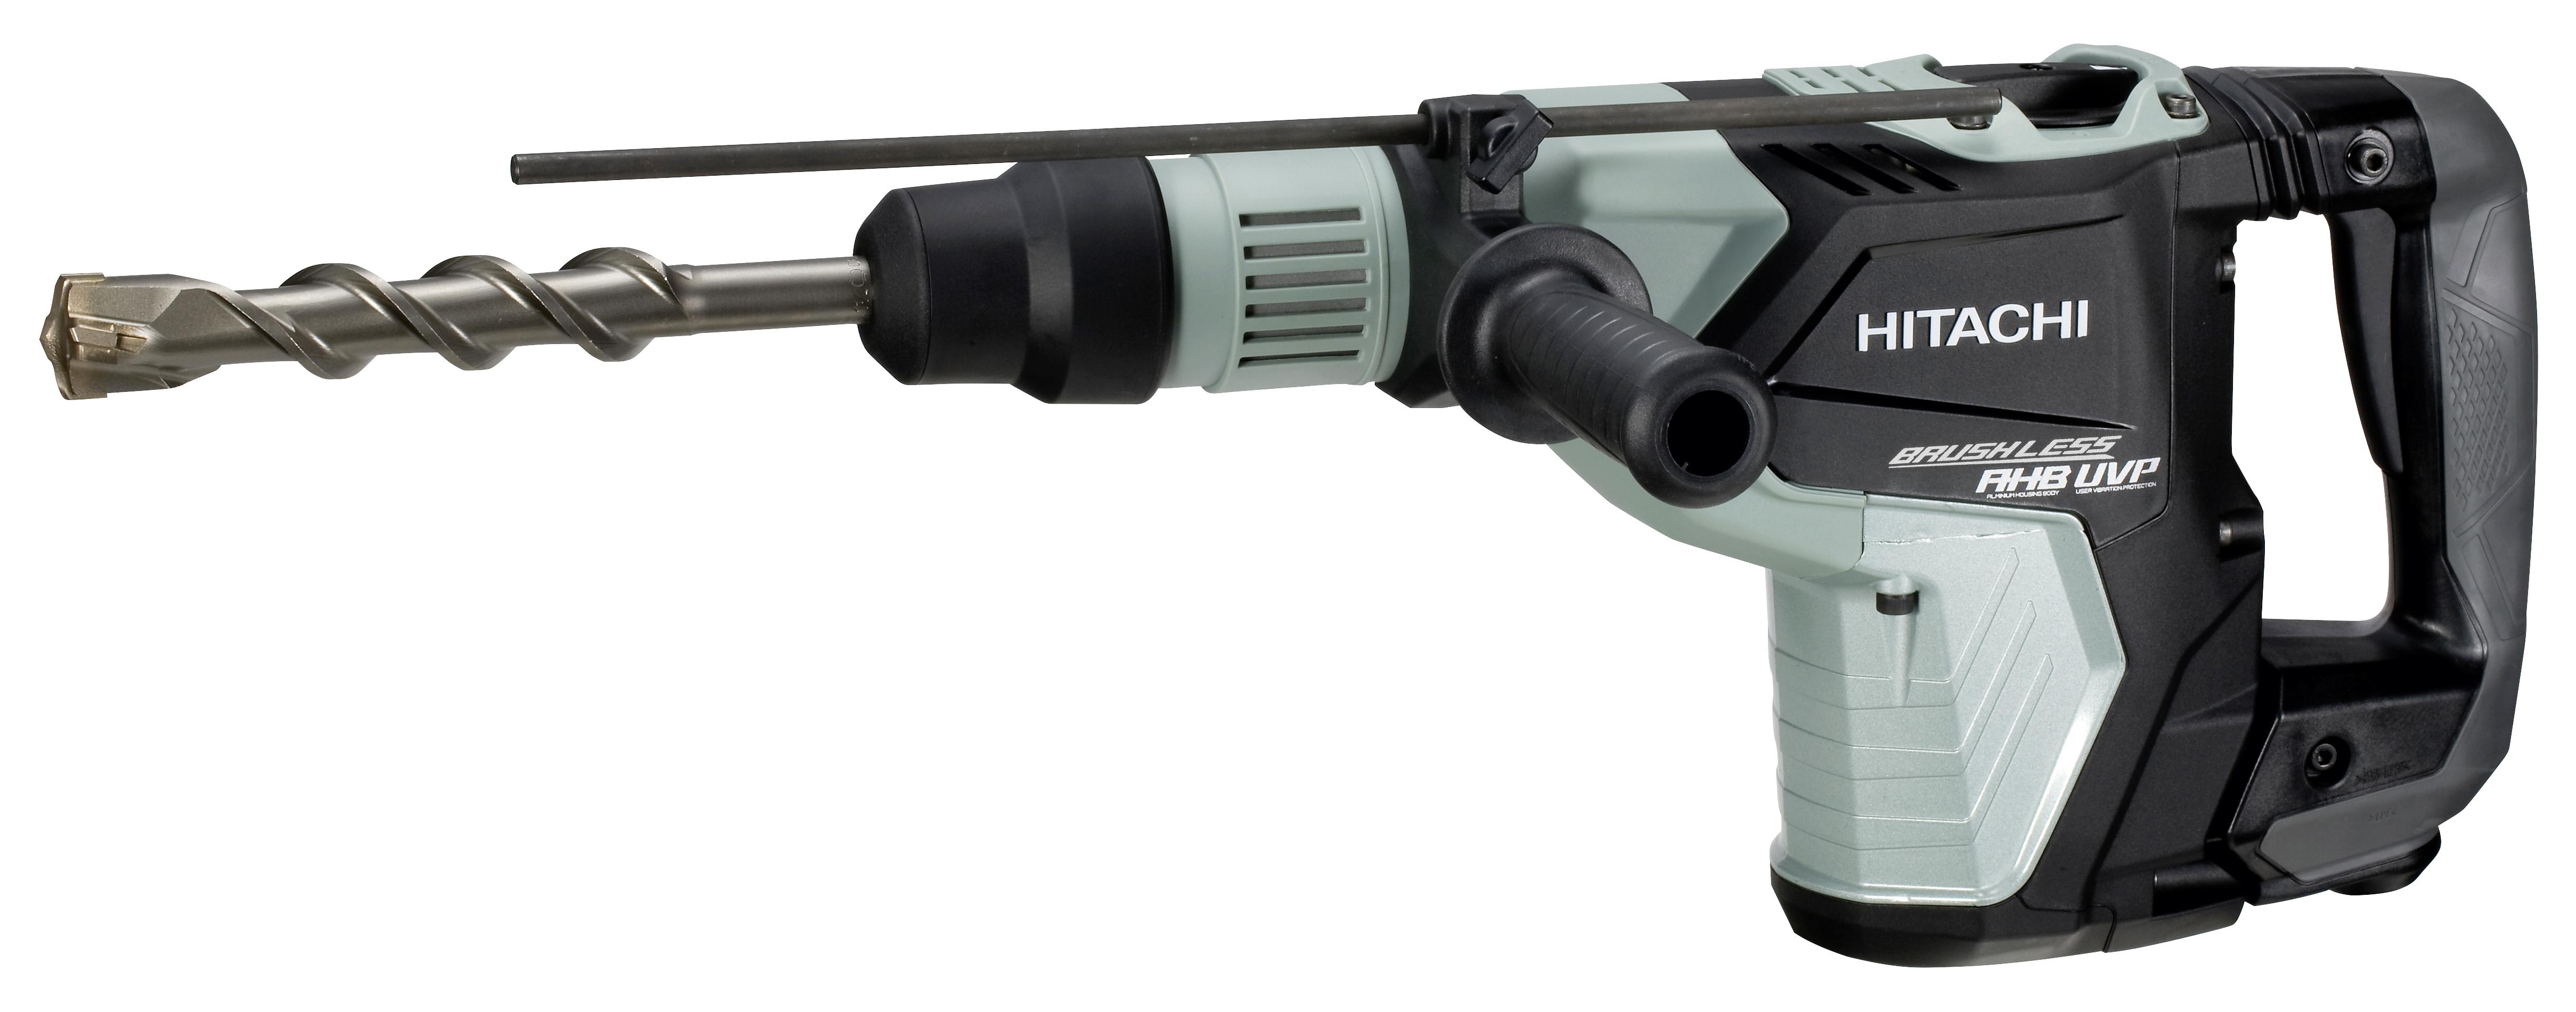 DH40MEY-Martillo-Combinado-sSDMax-11-J-Brushless